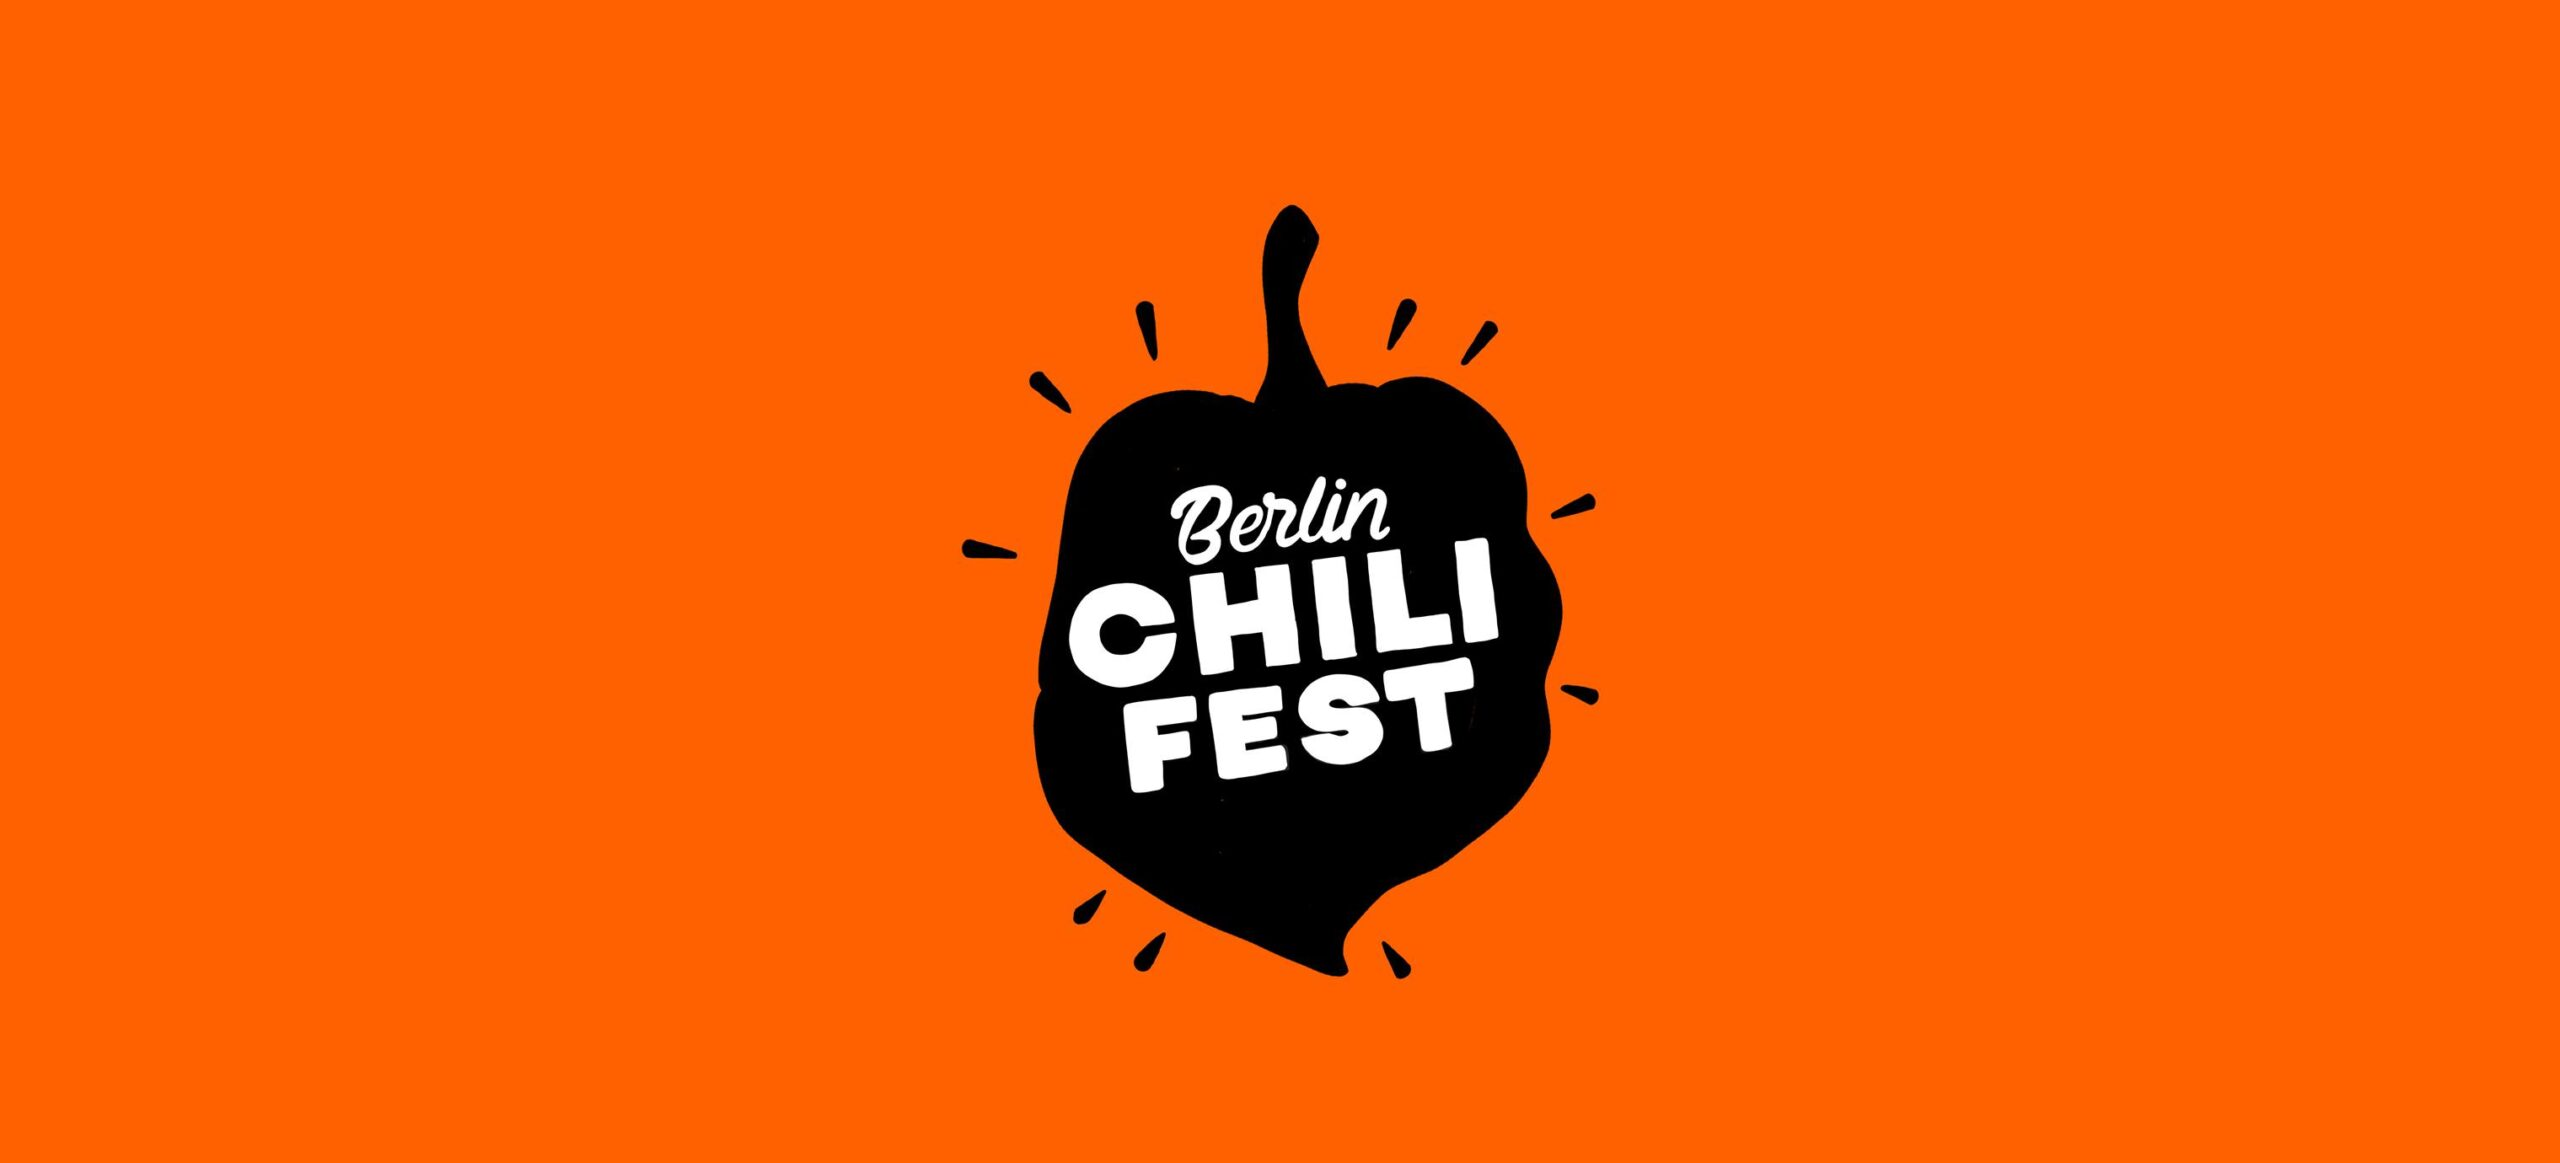 Berlin Chili Festival Saturday 26th September 2020